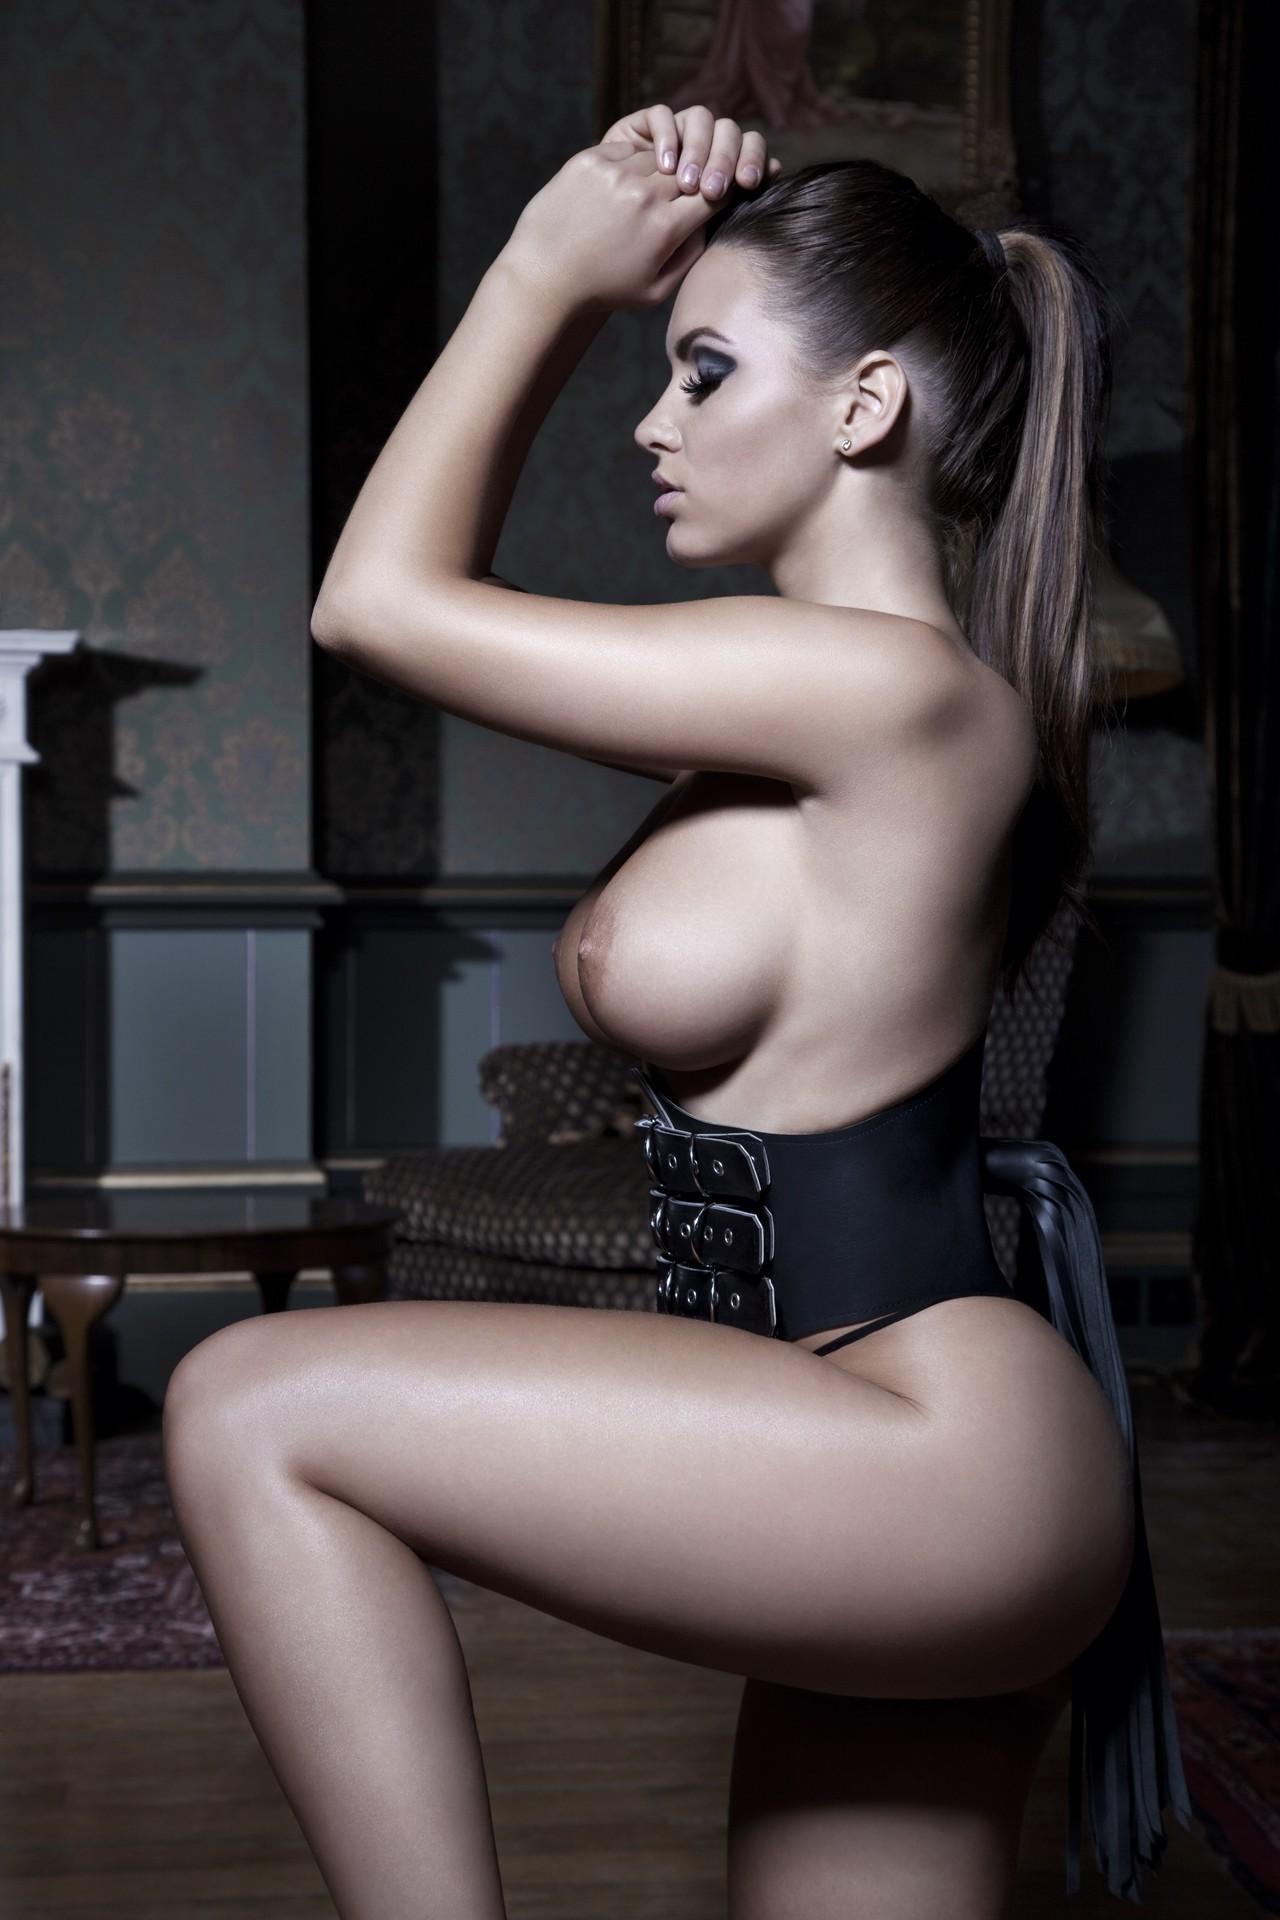 Tamil Naked Girl Tumblr